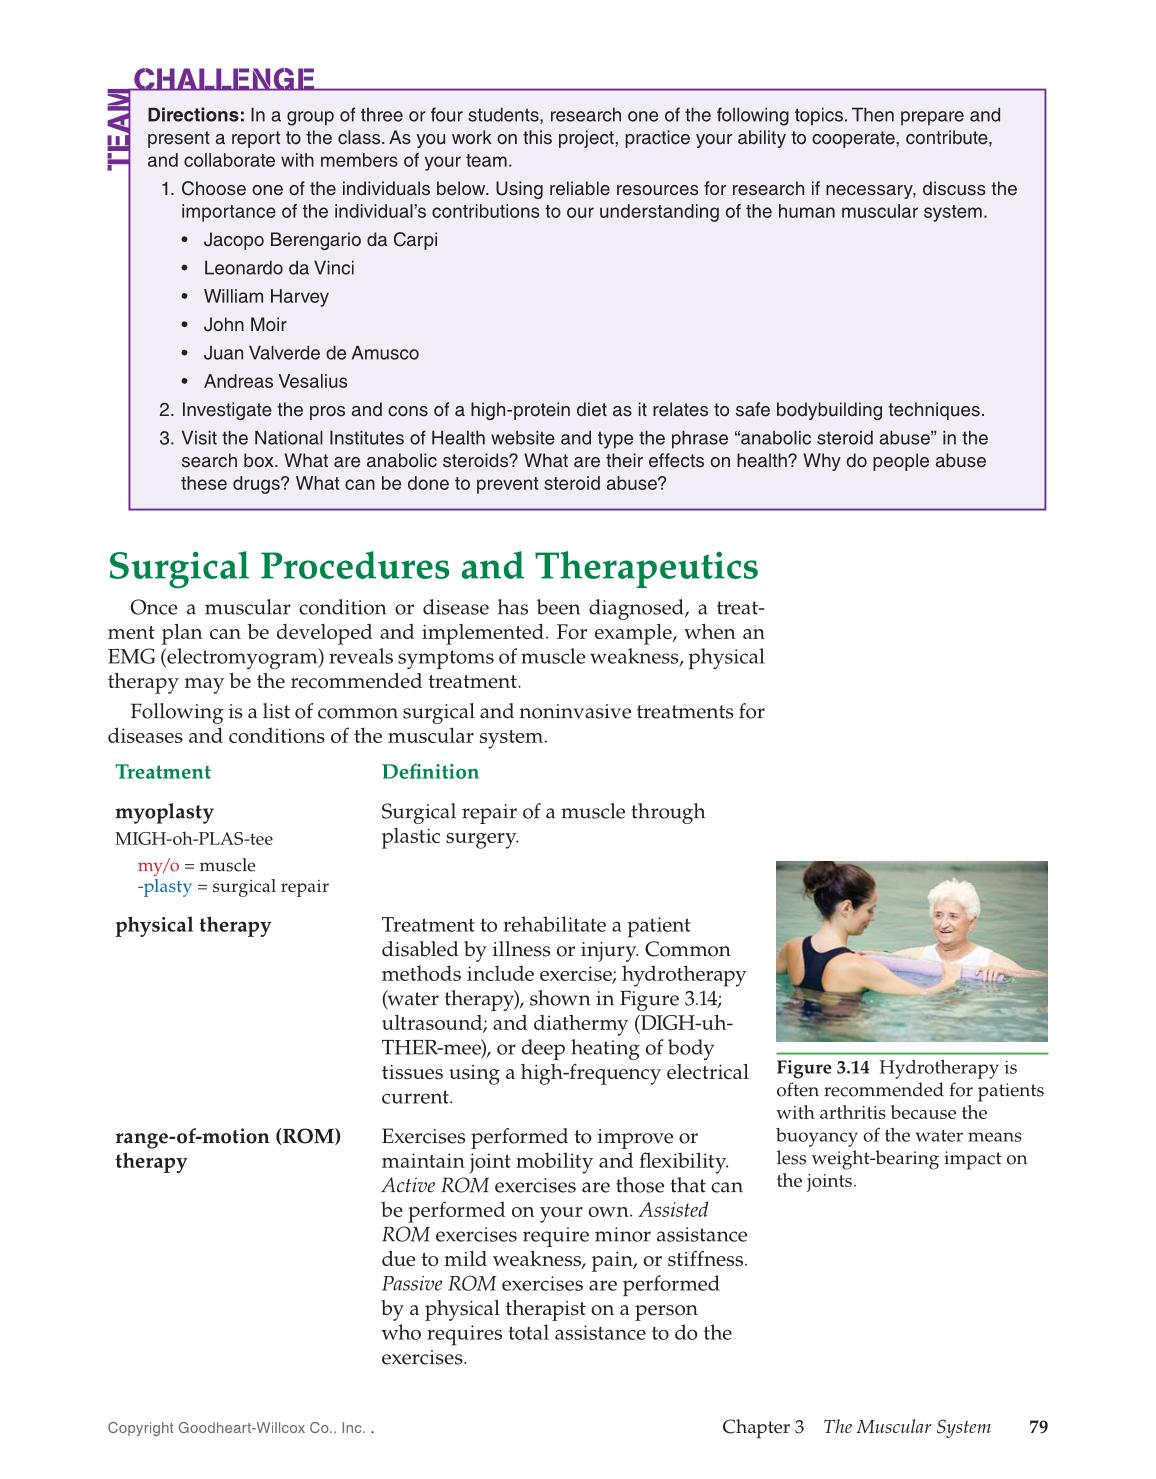 image regarding Medical Terminology List Printable named Printable: Advent toward Professional medical Terminology, 1st Variation